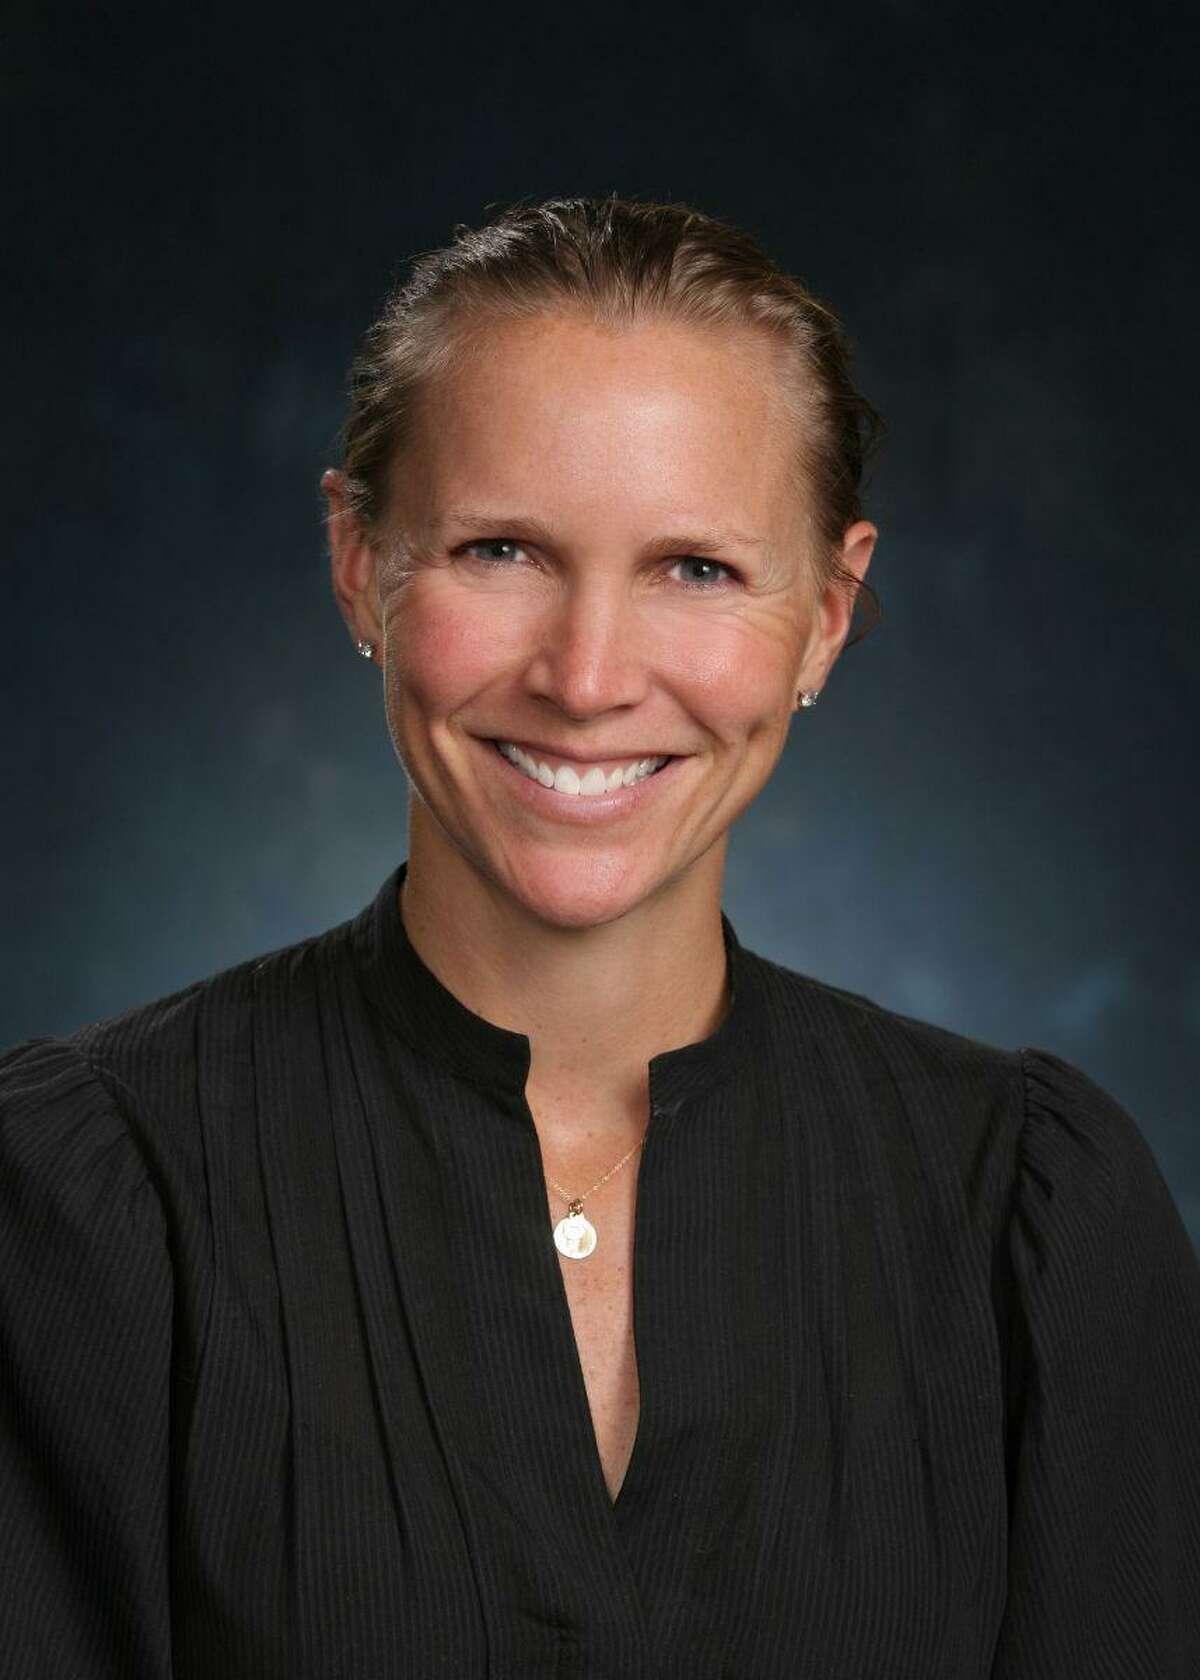 Heather Houston is the new executive director of Scenic Houston.